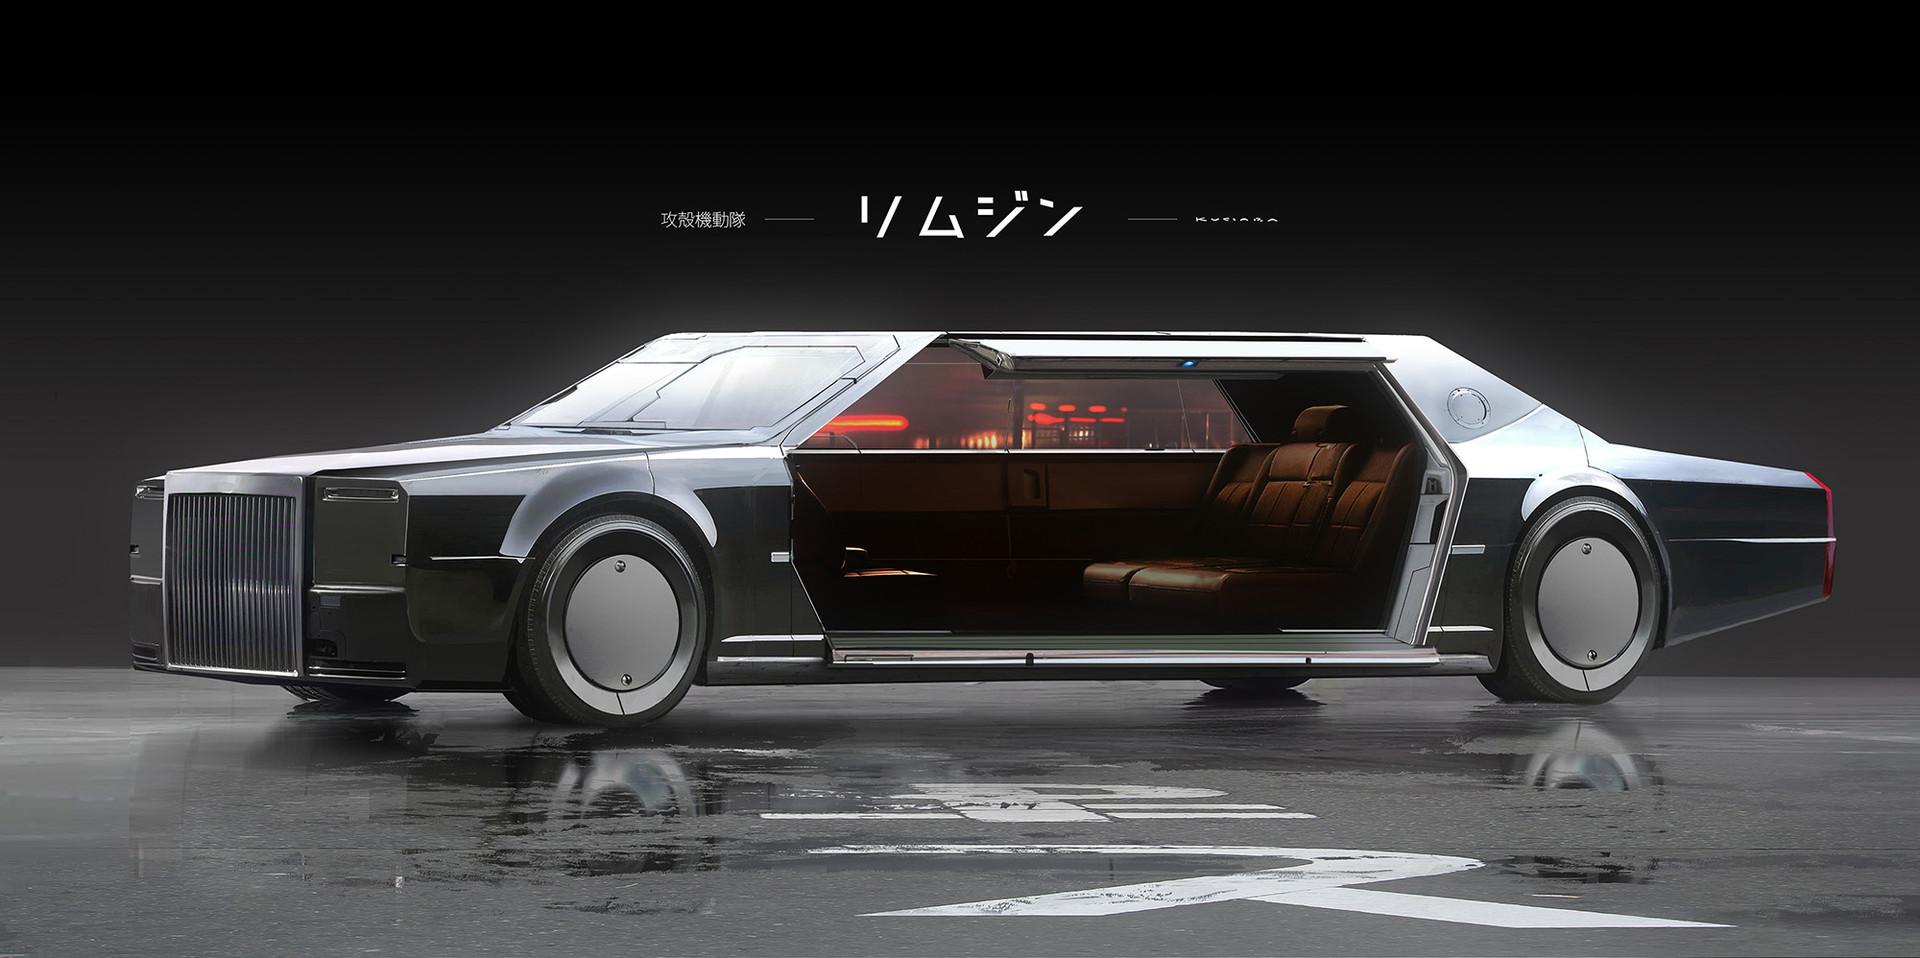 maciej-kuciara-gits-veh-limousine-mk-070